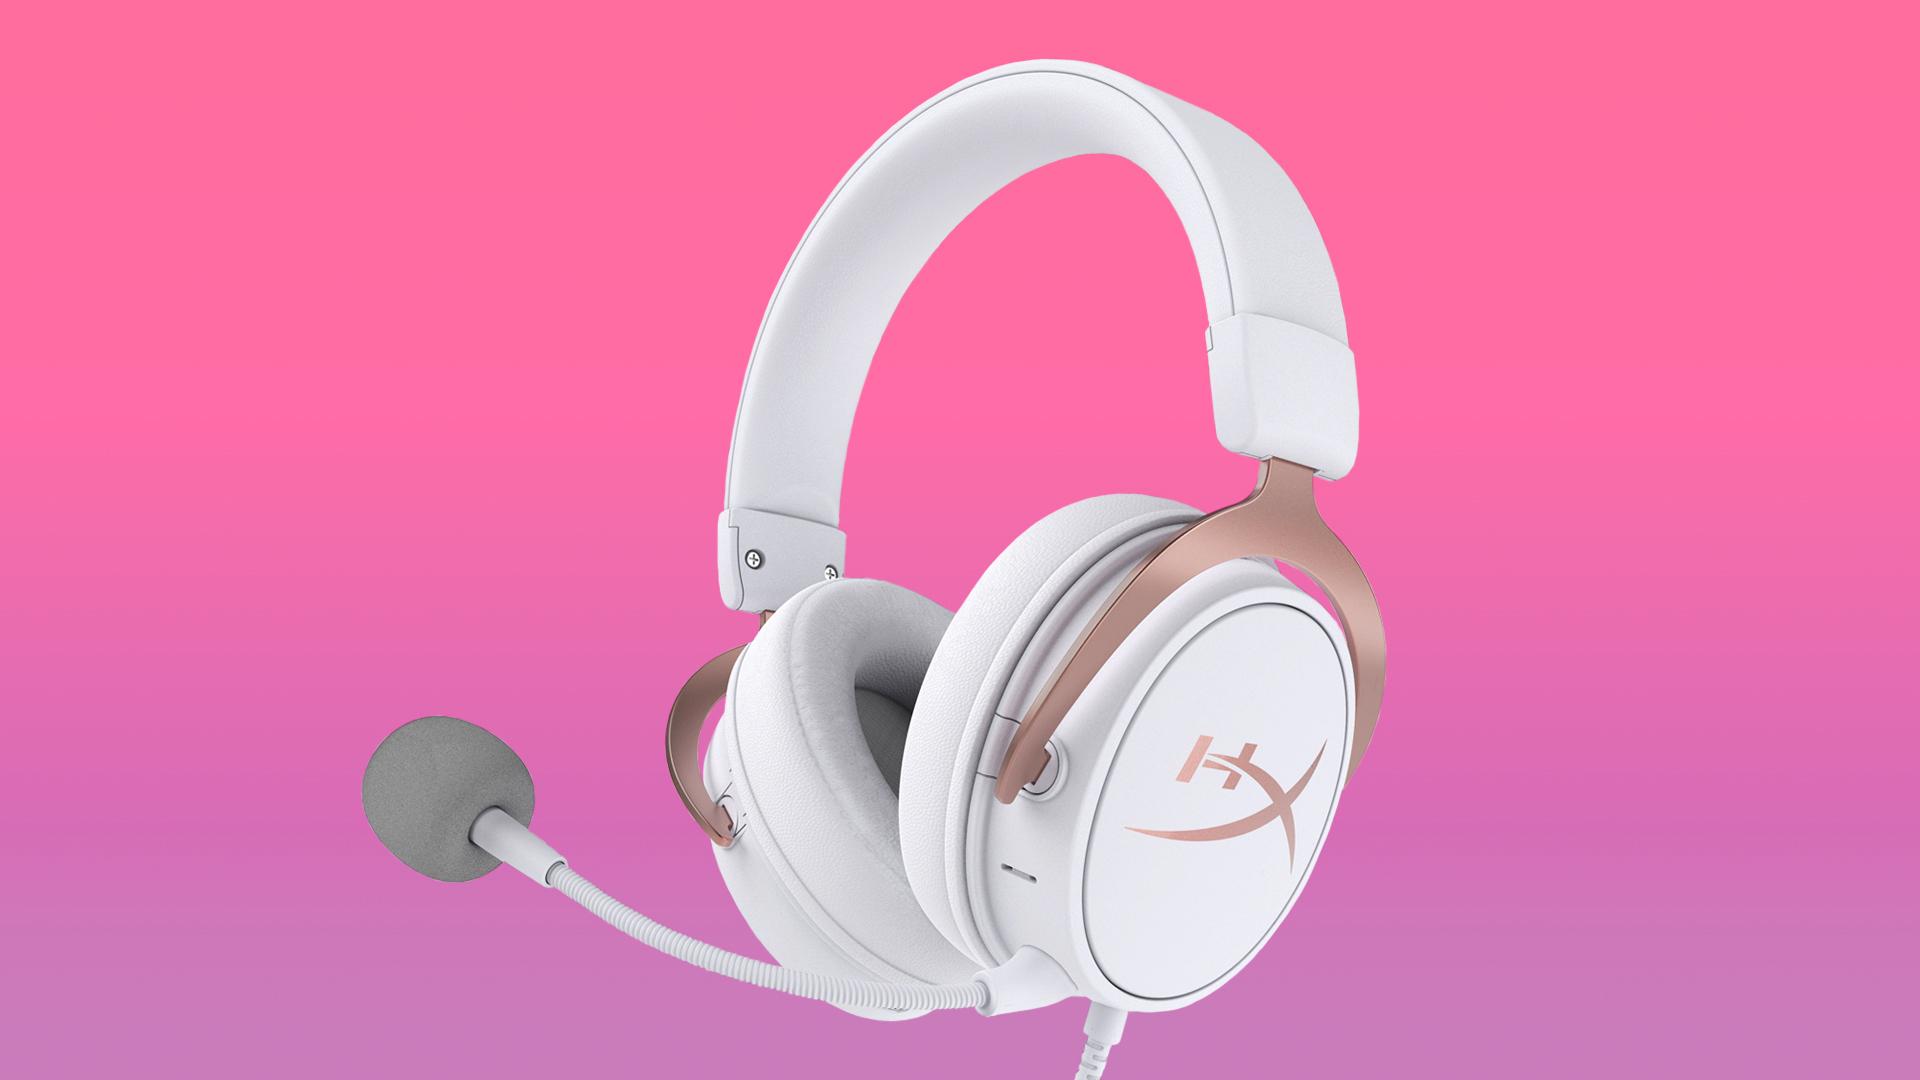 Cloud Mix Rose Gold Headphones